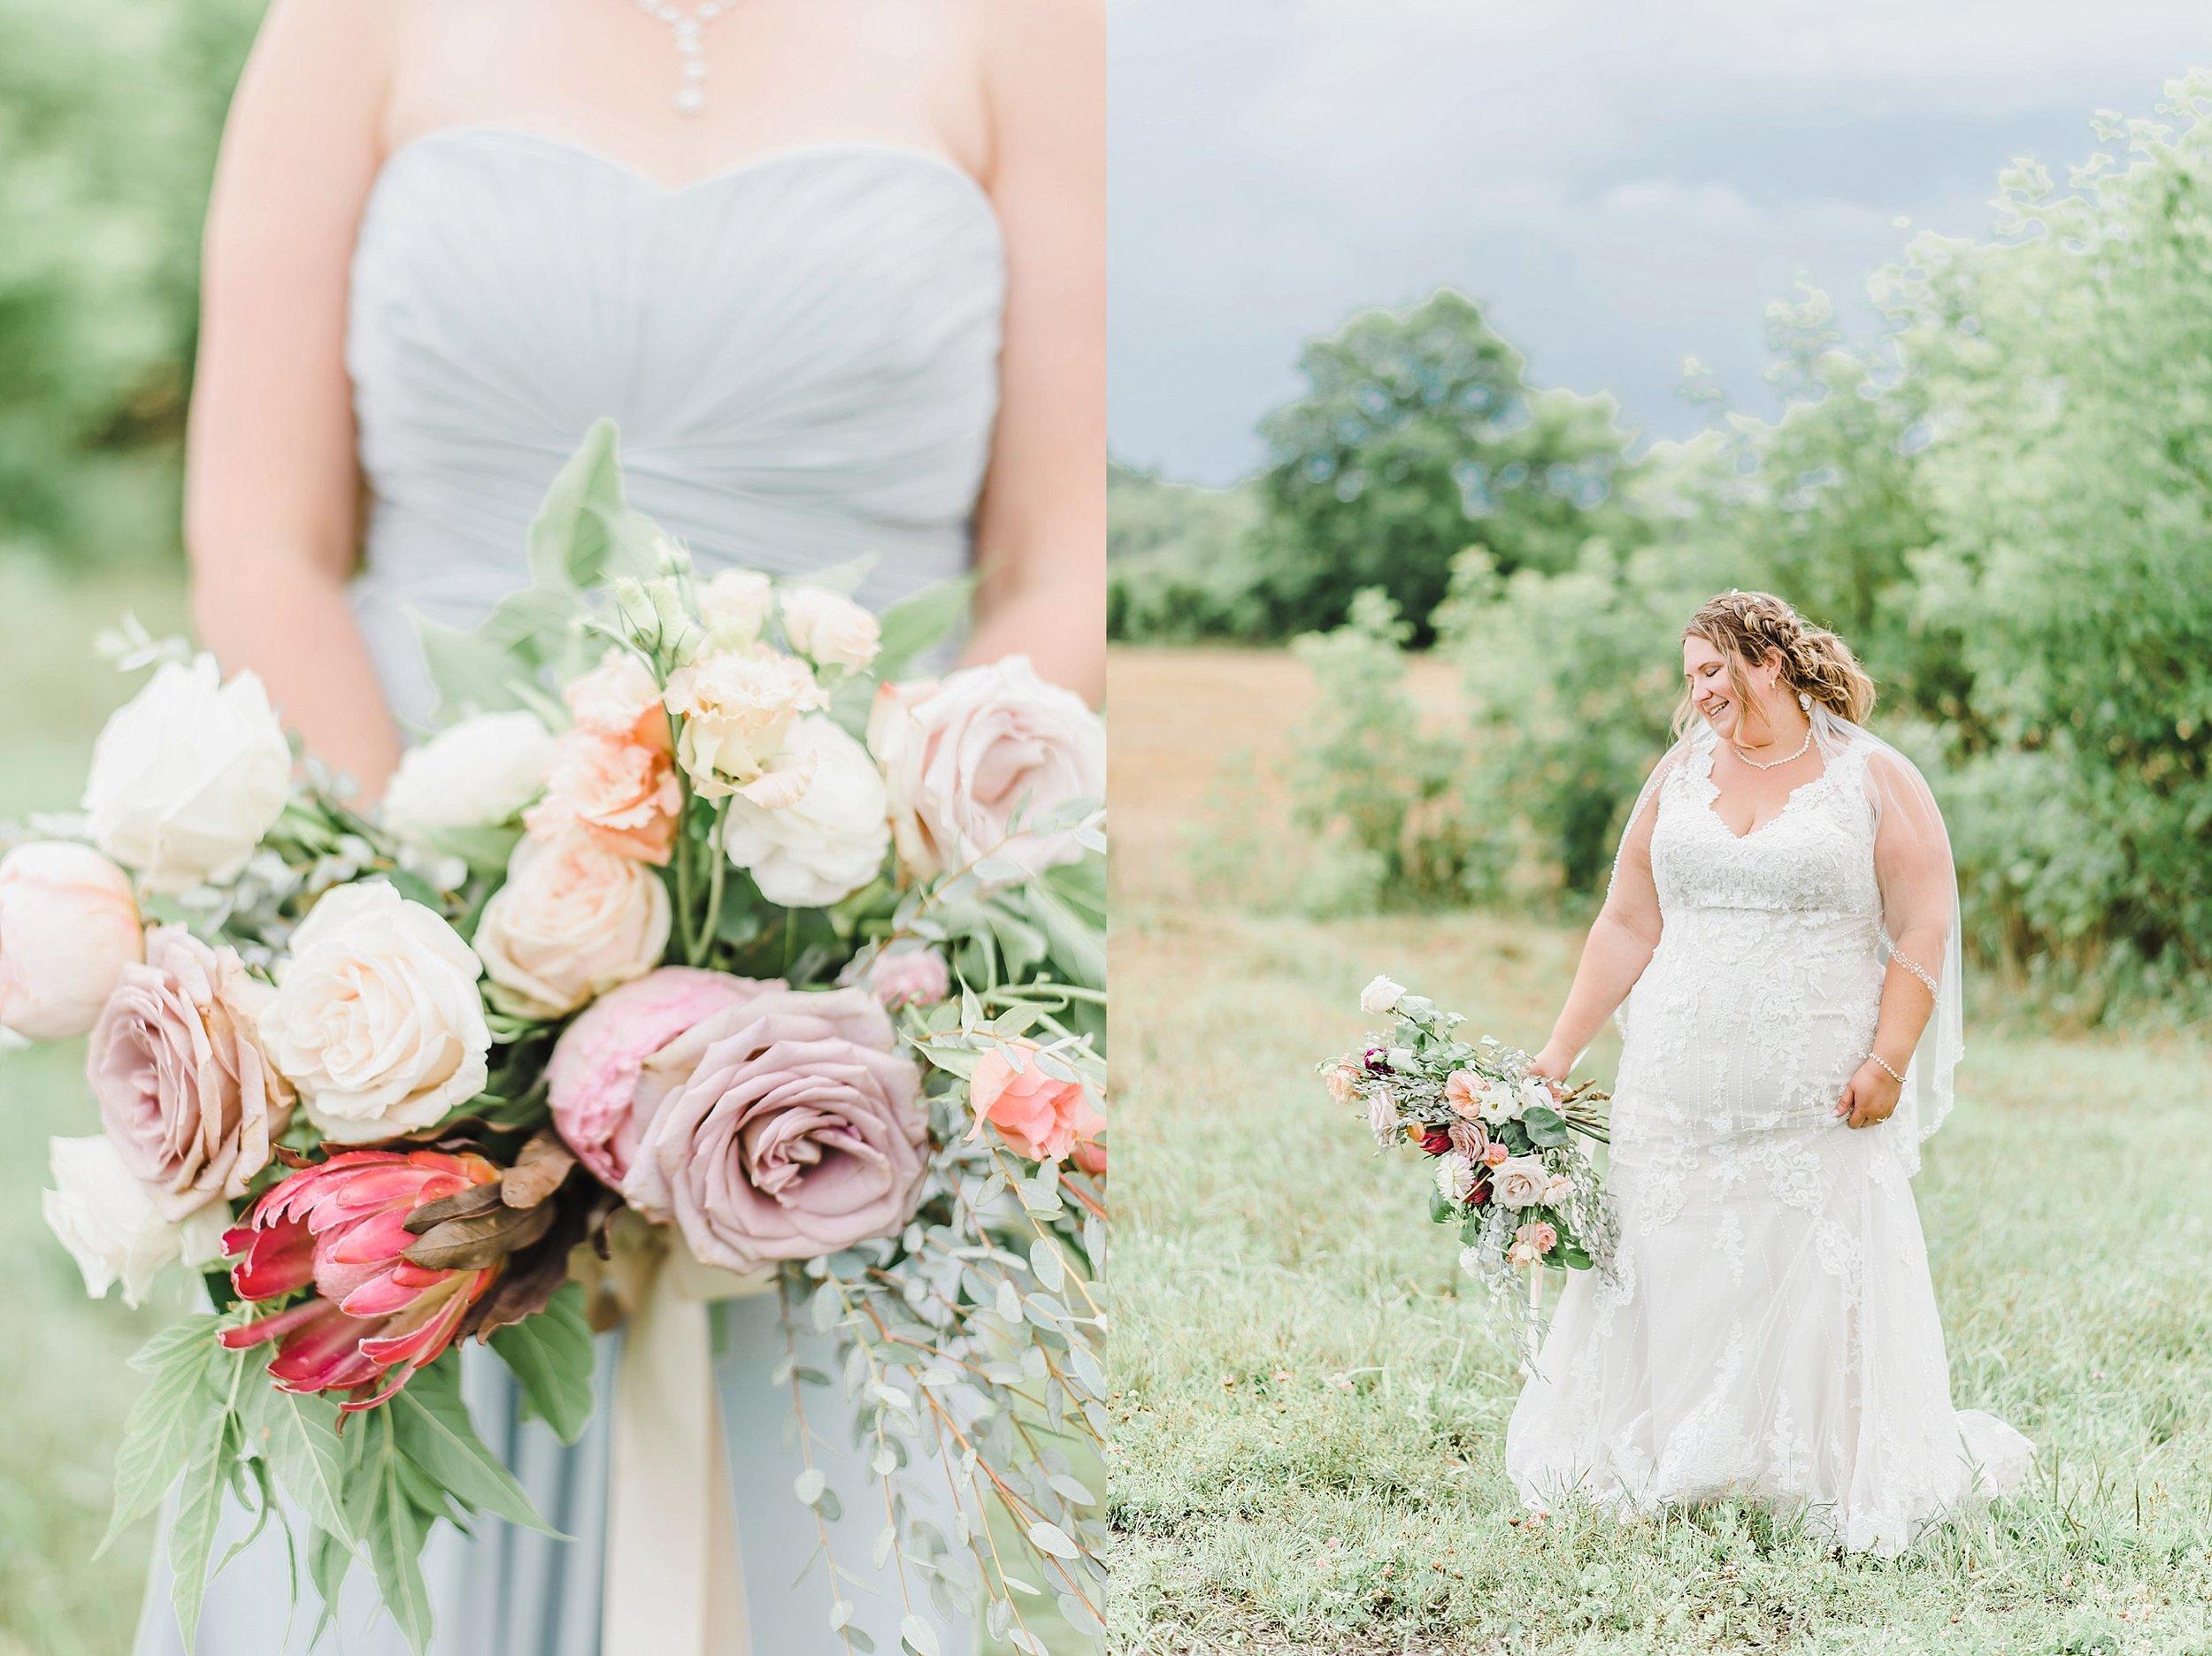 light airy indie fine art ottawa wedding photographer | Ali and Batoul Photography_0418.jpg